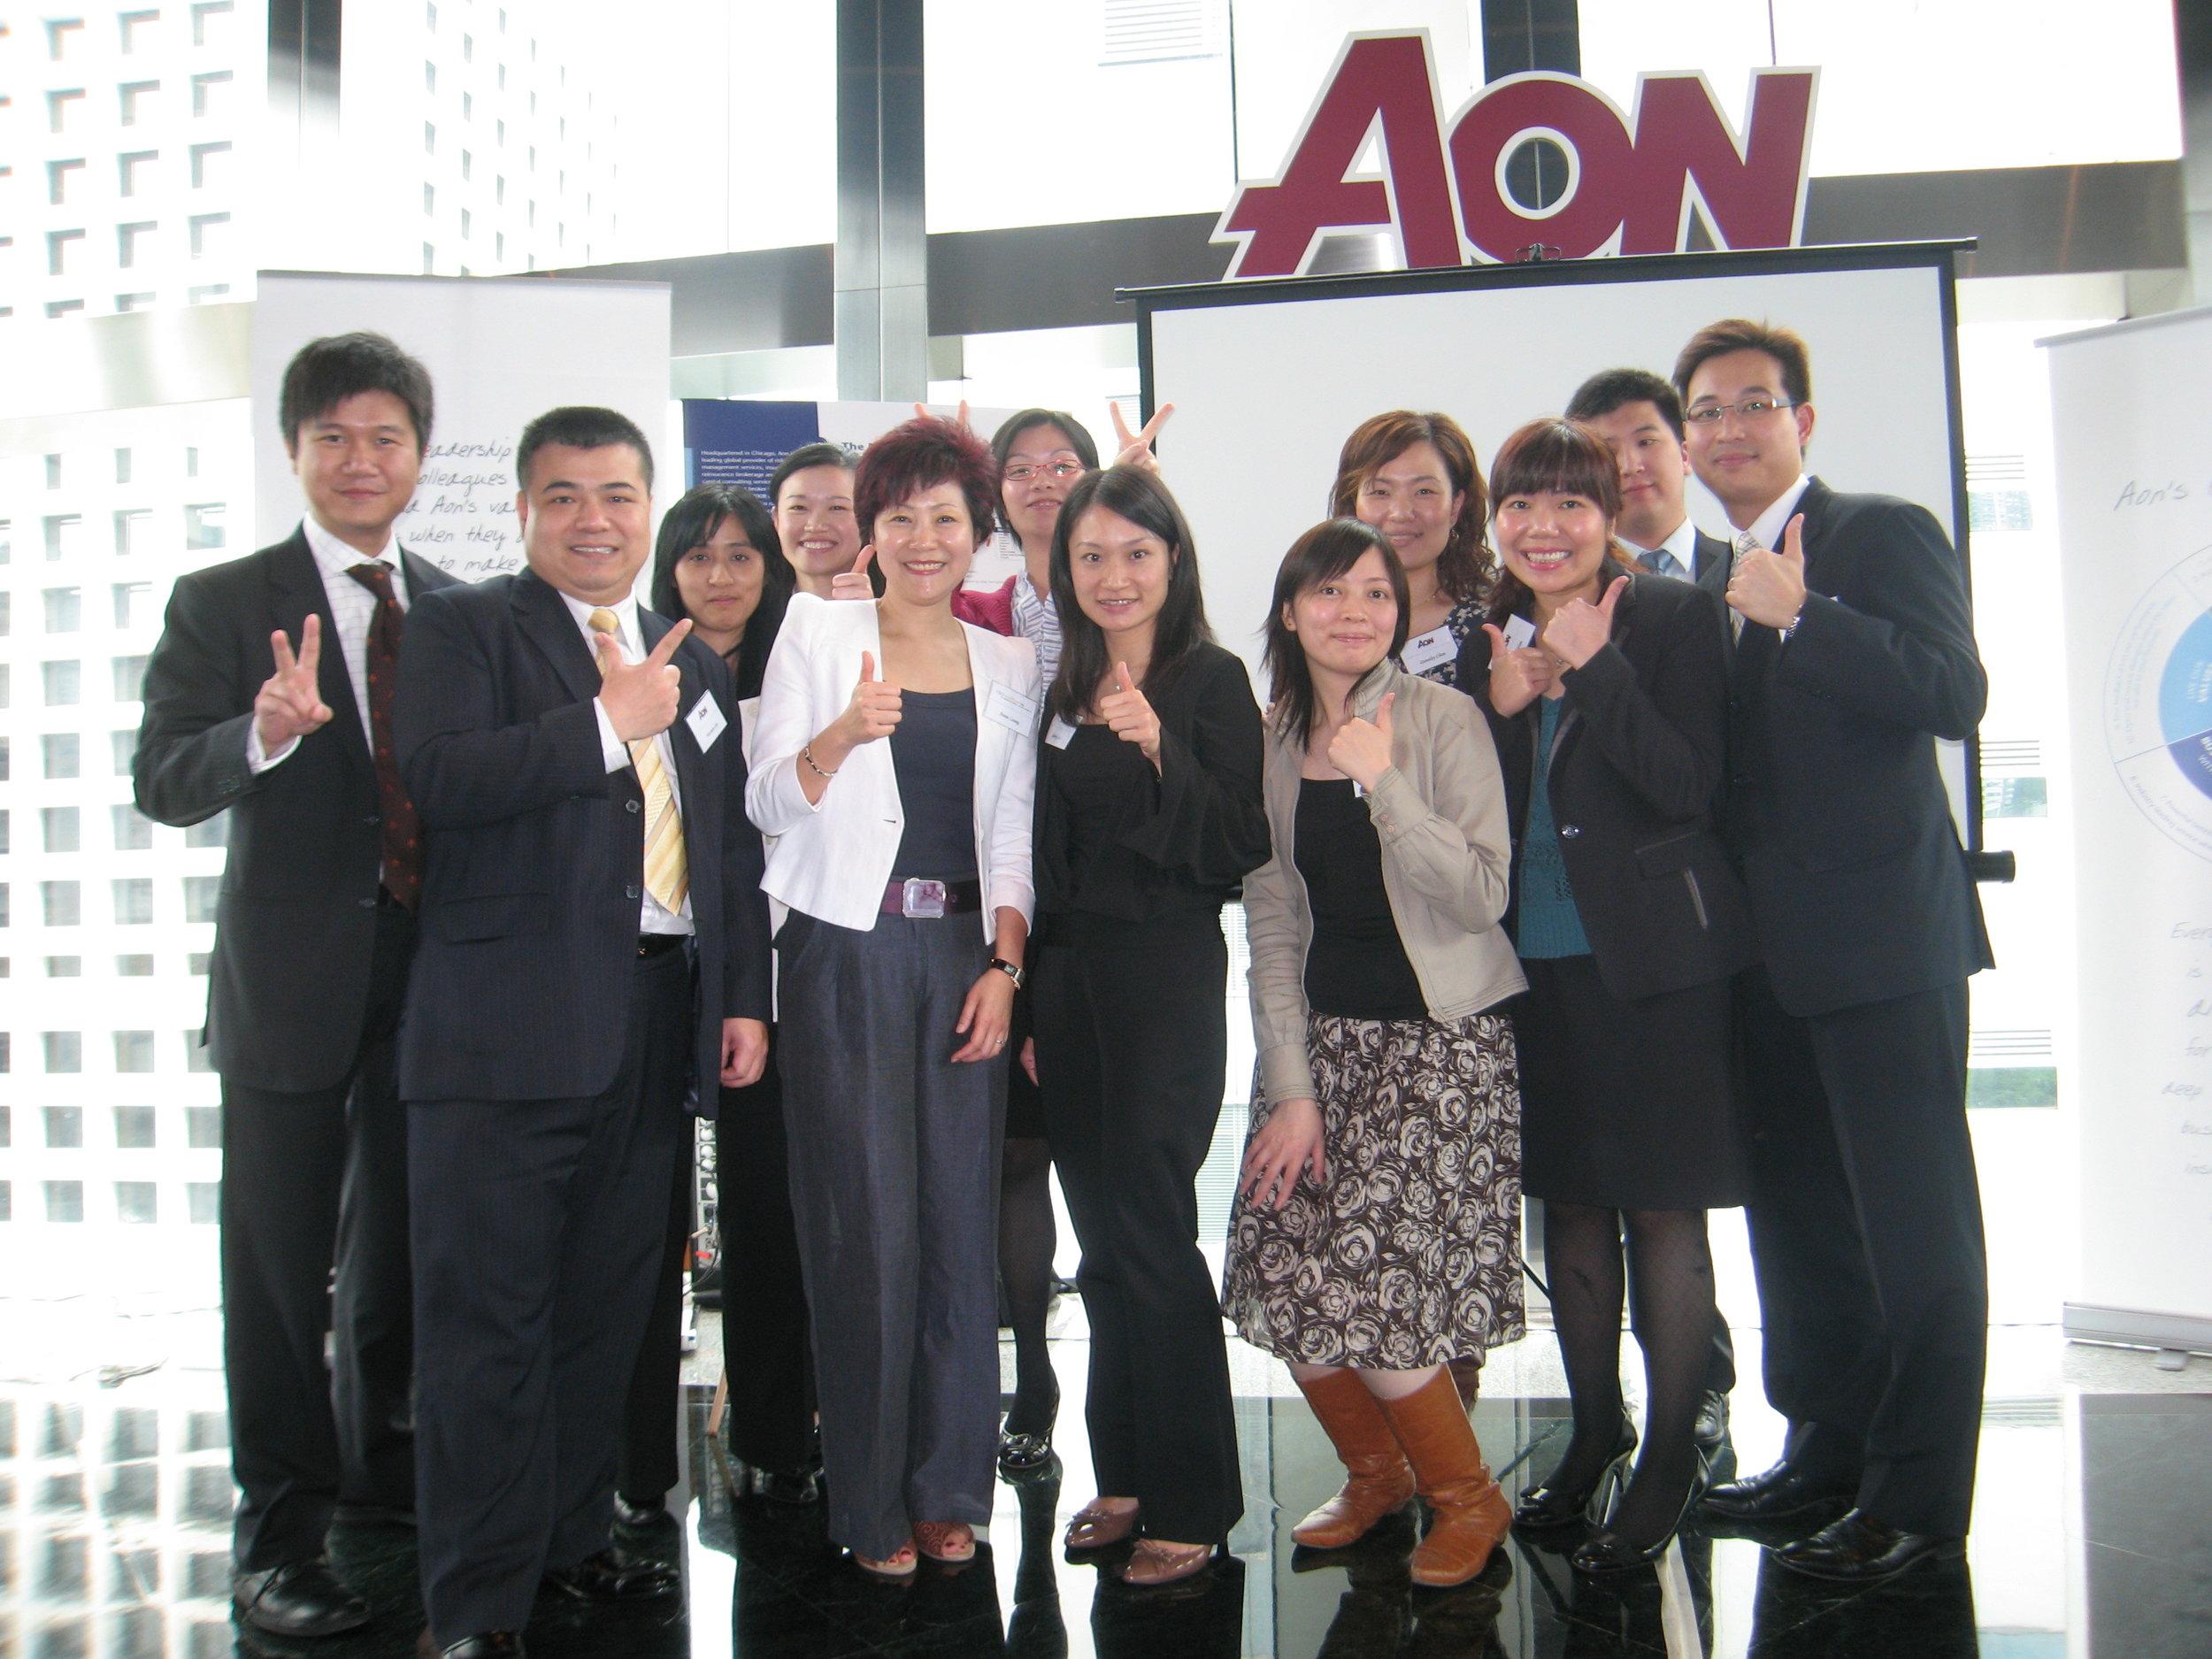 怡安(香港)保險顧問有限公司   Peak Performance mindPower™ Leadership Program (Managers), 2009.